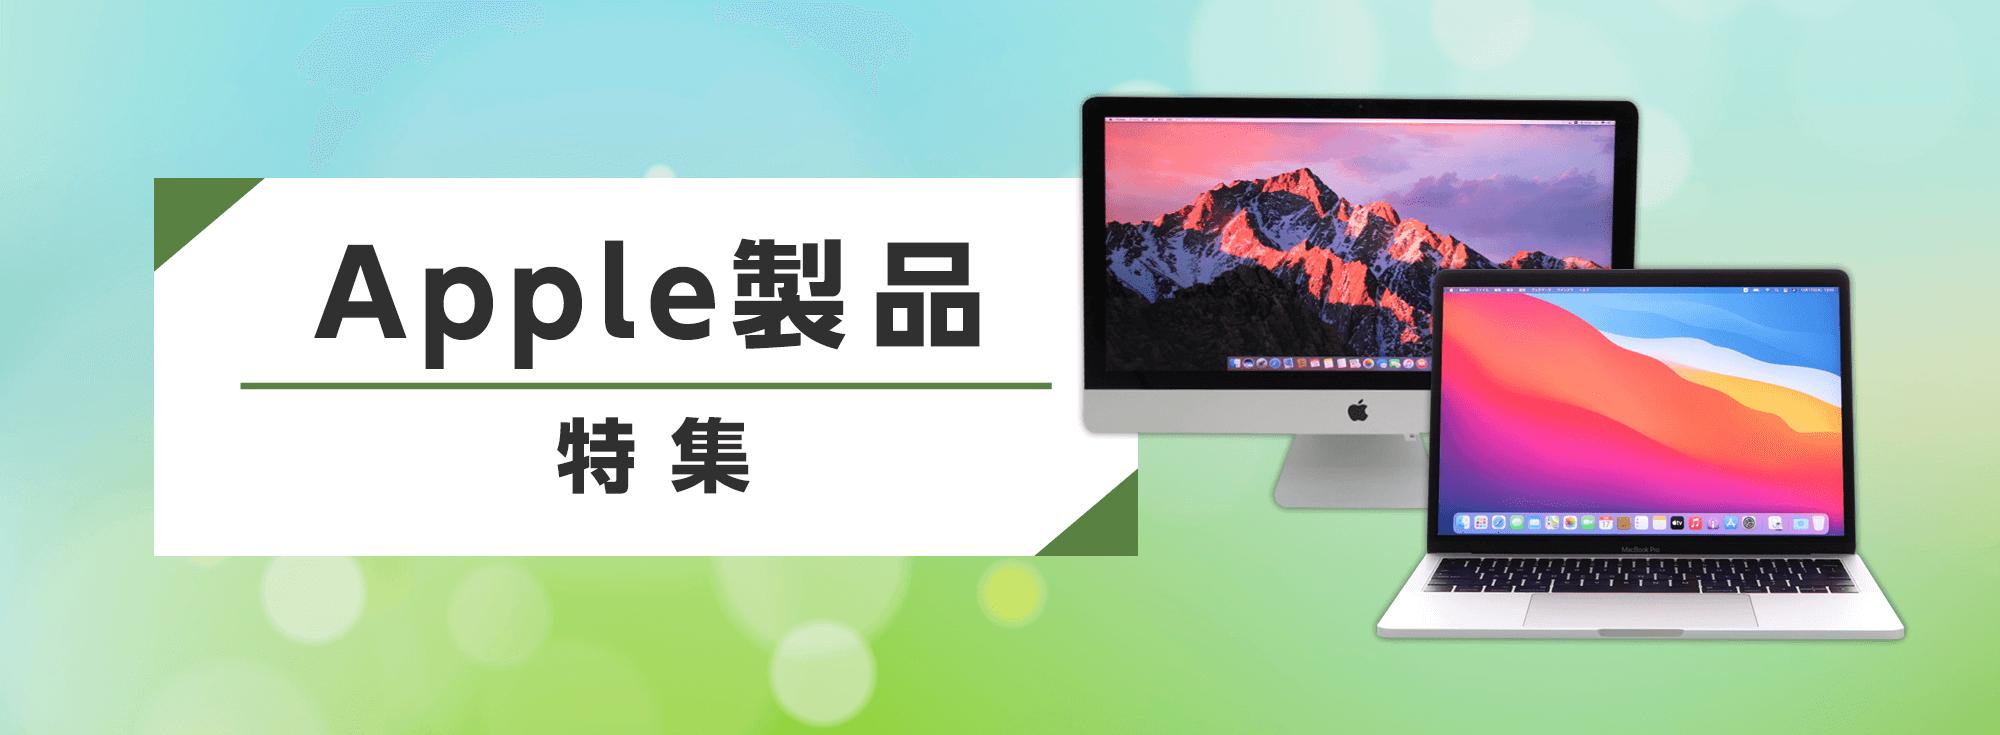 Mac製品特集